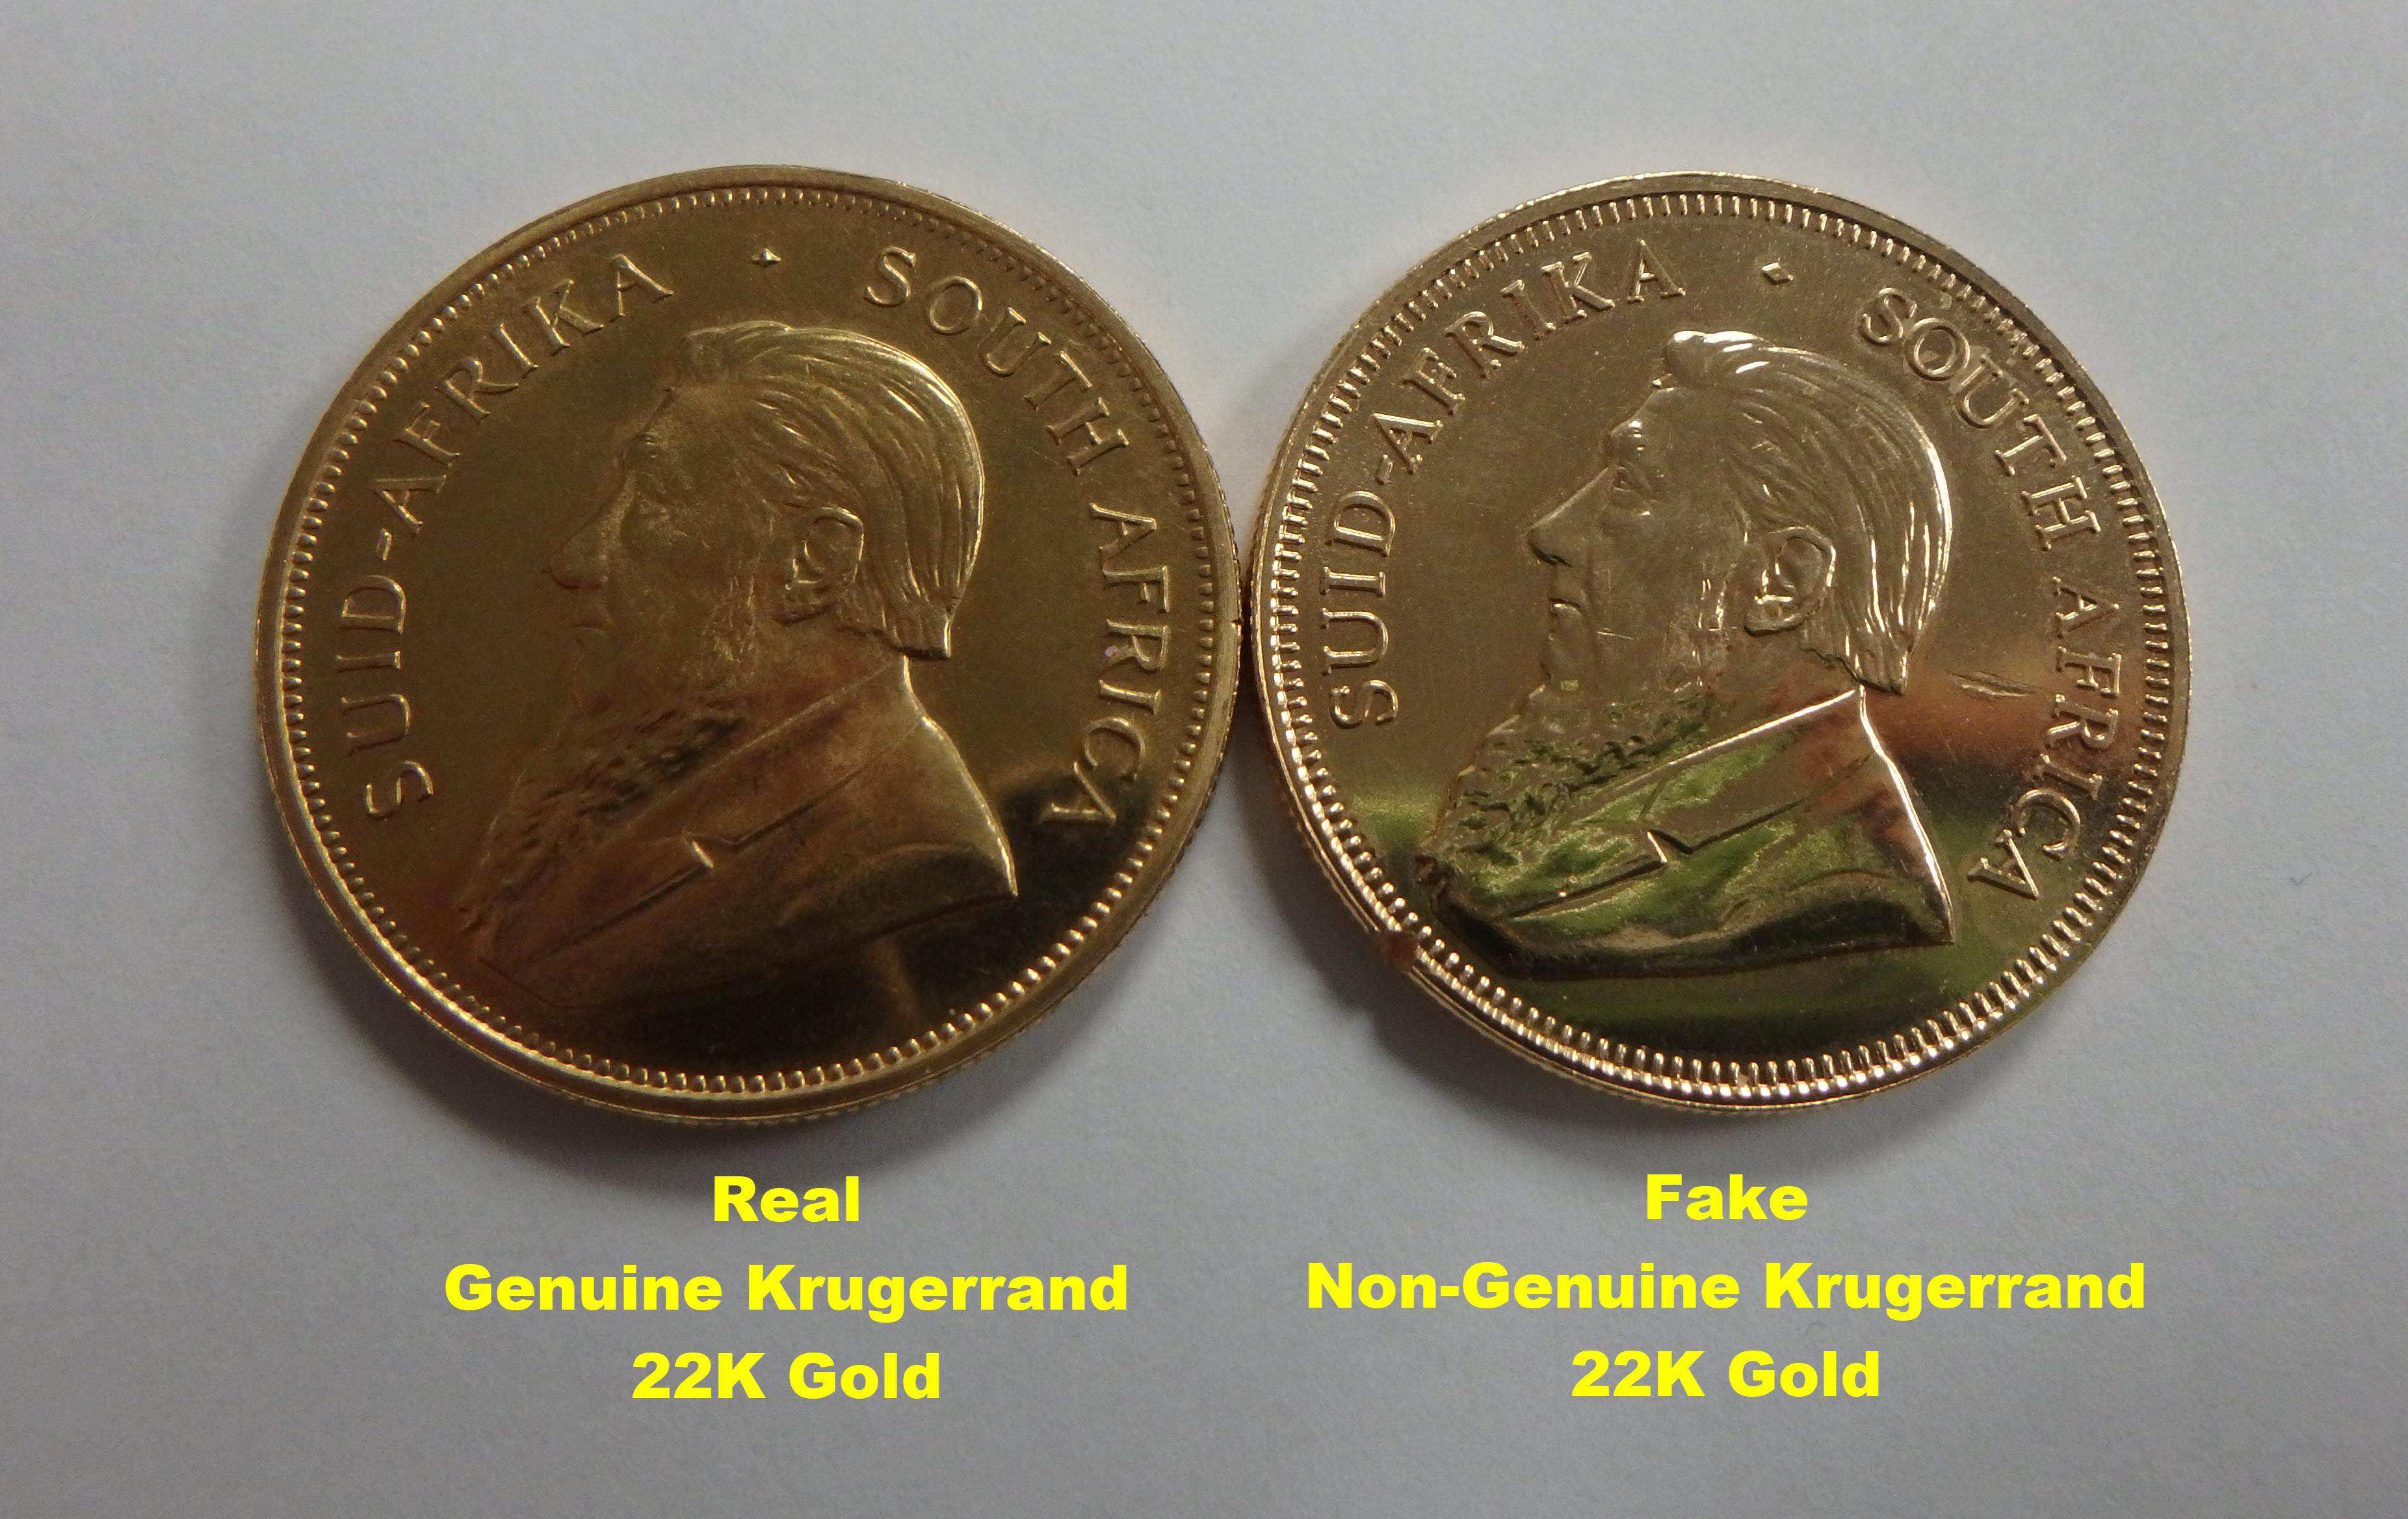 Real Gold Non-Genuine Krugerrand | Portland Gold Buyers, LLC